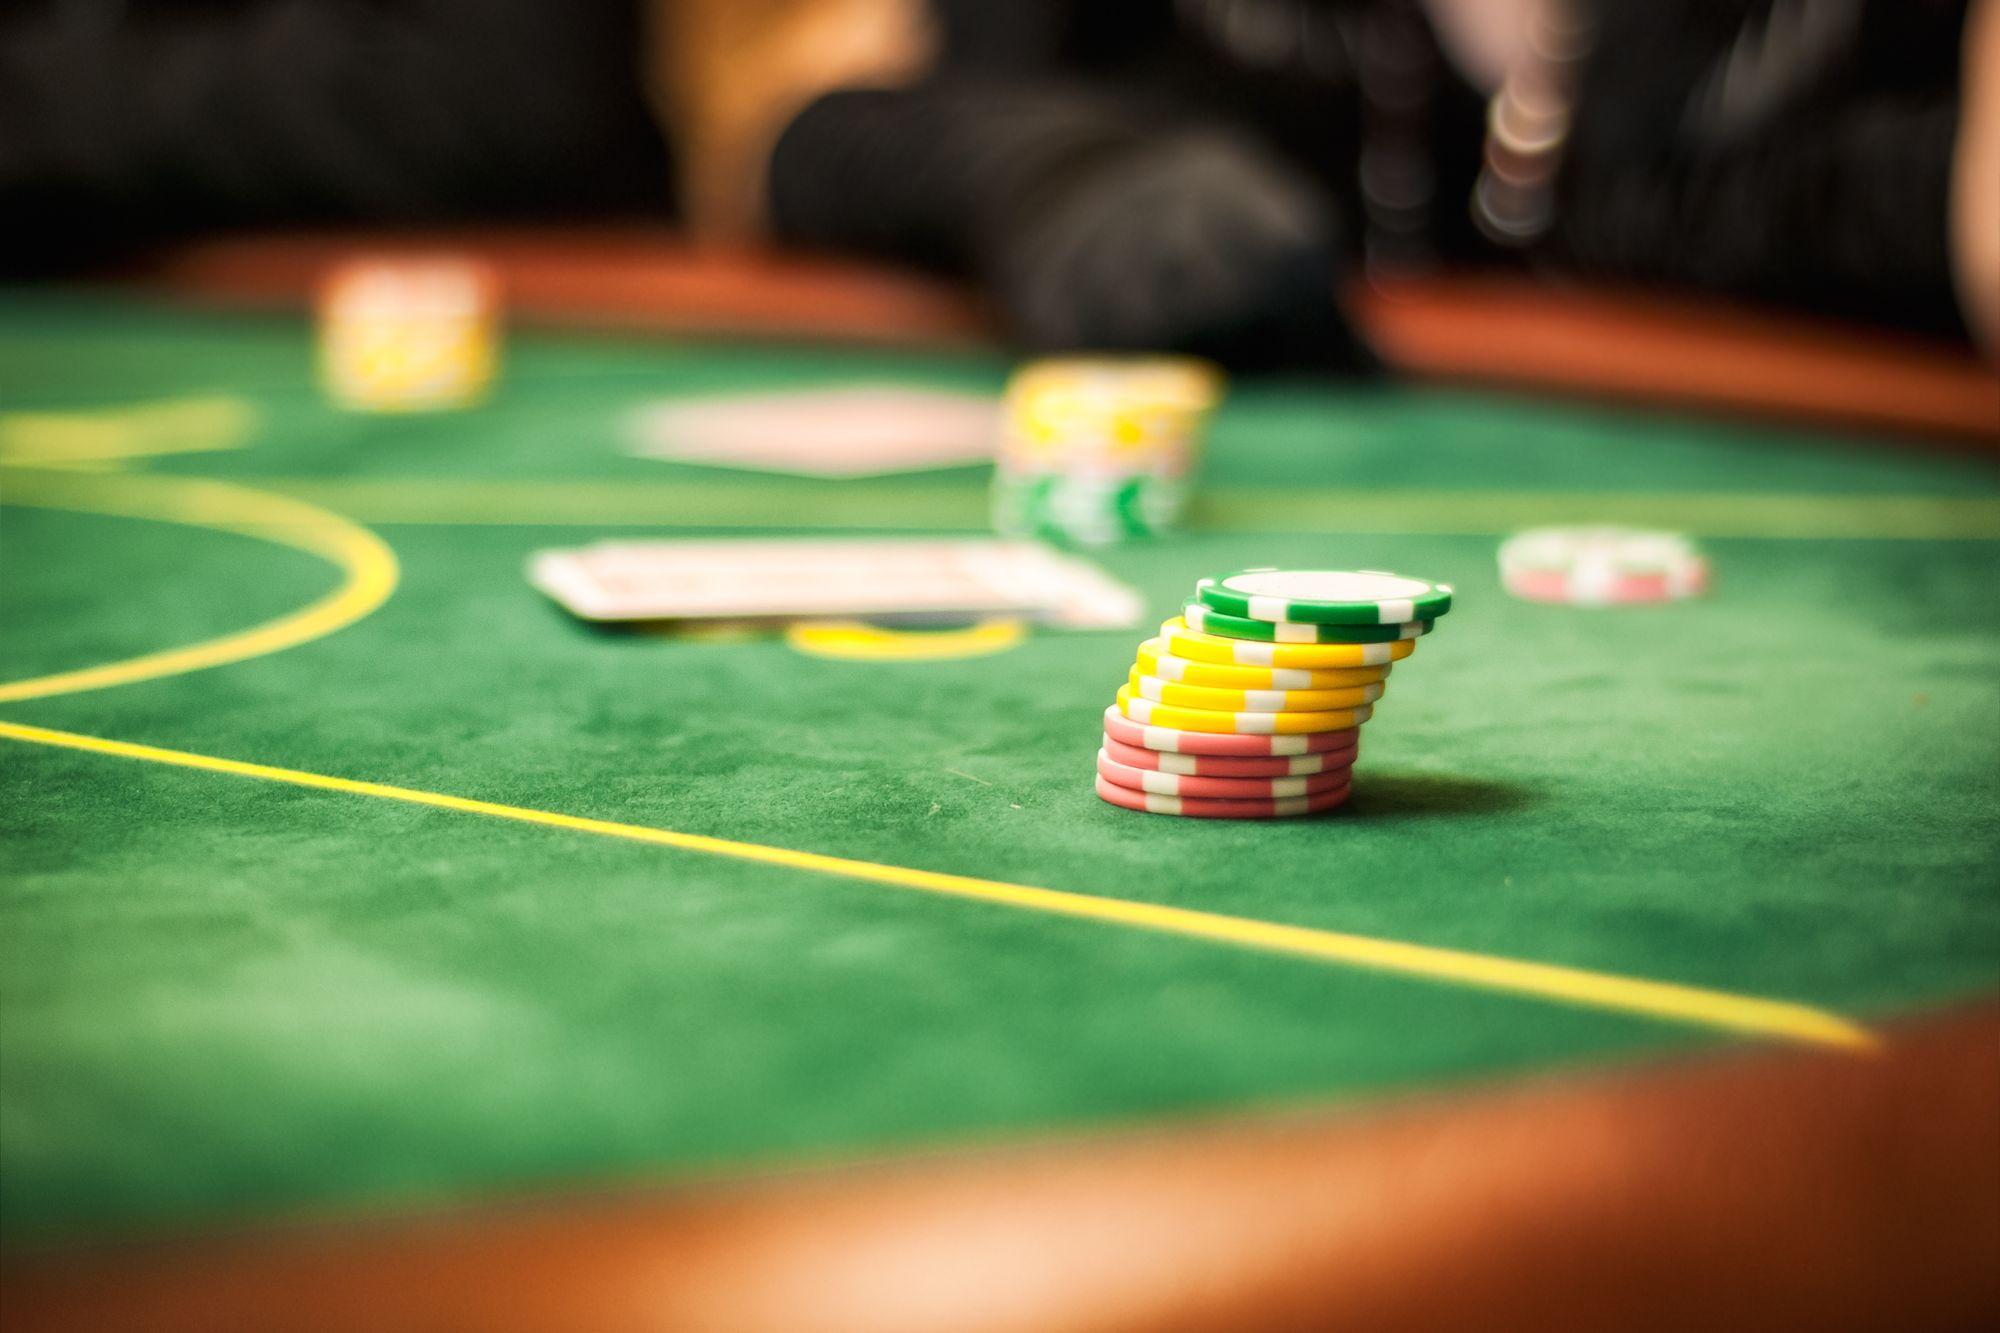 Worst betting losses encantamentos minecraft 1-3 2-4 betting system